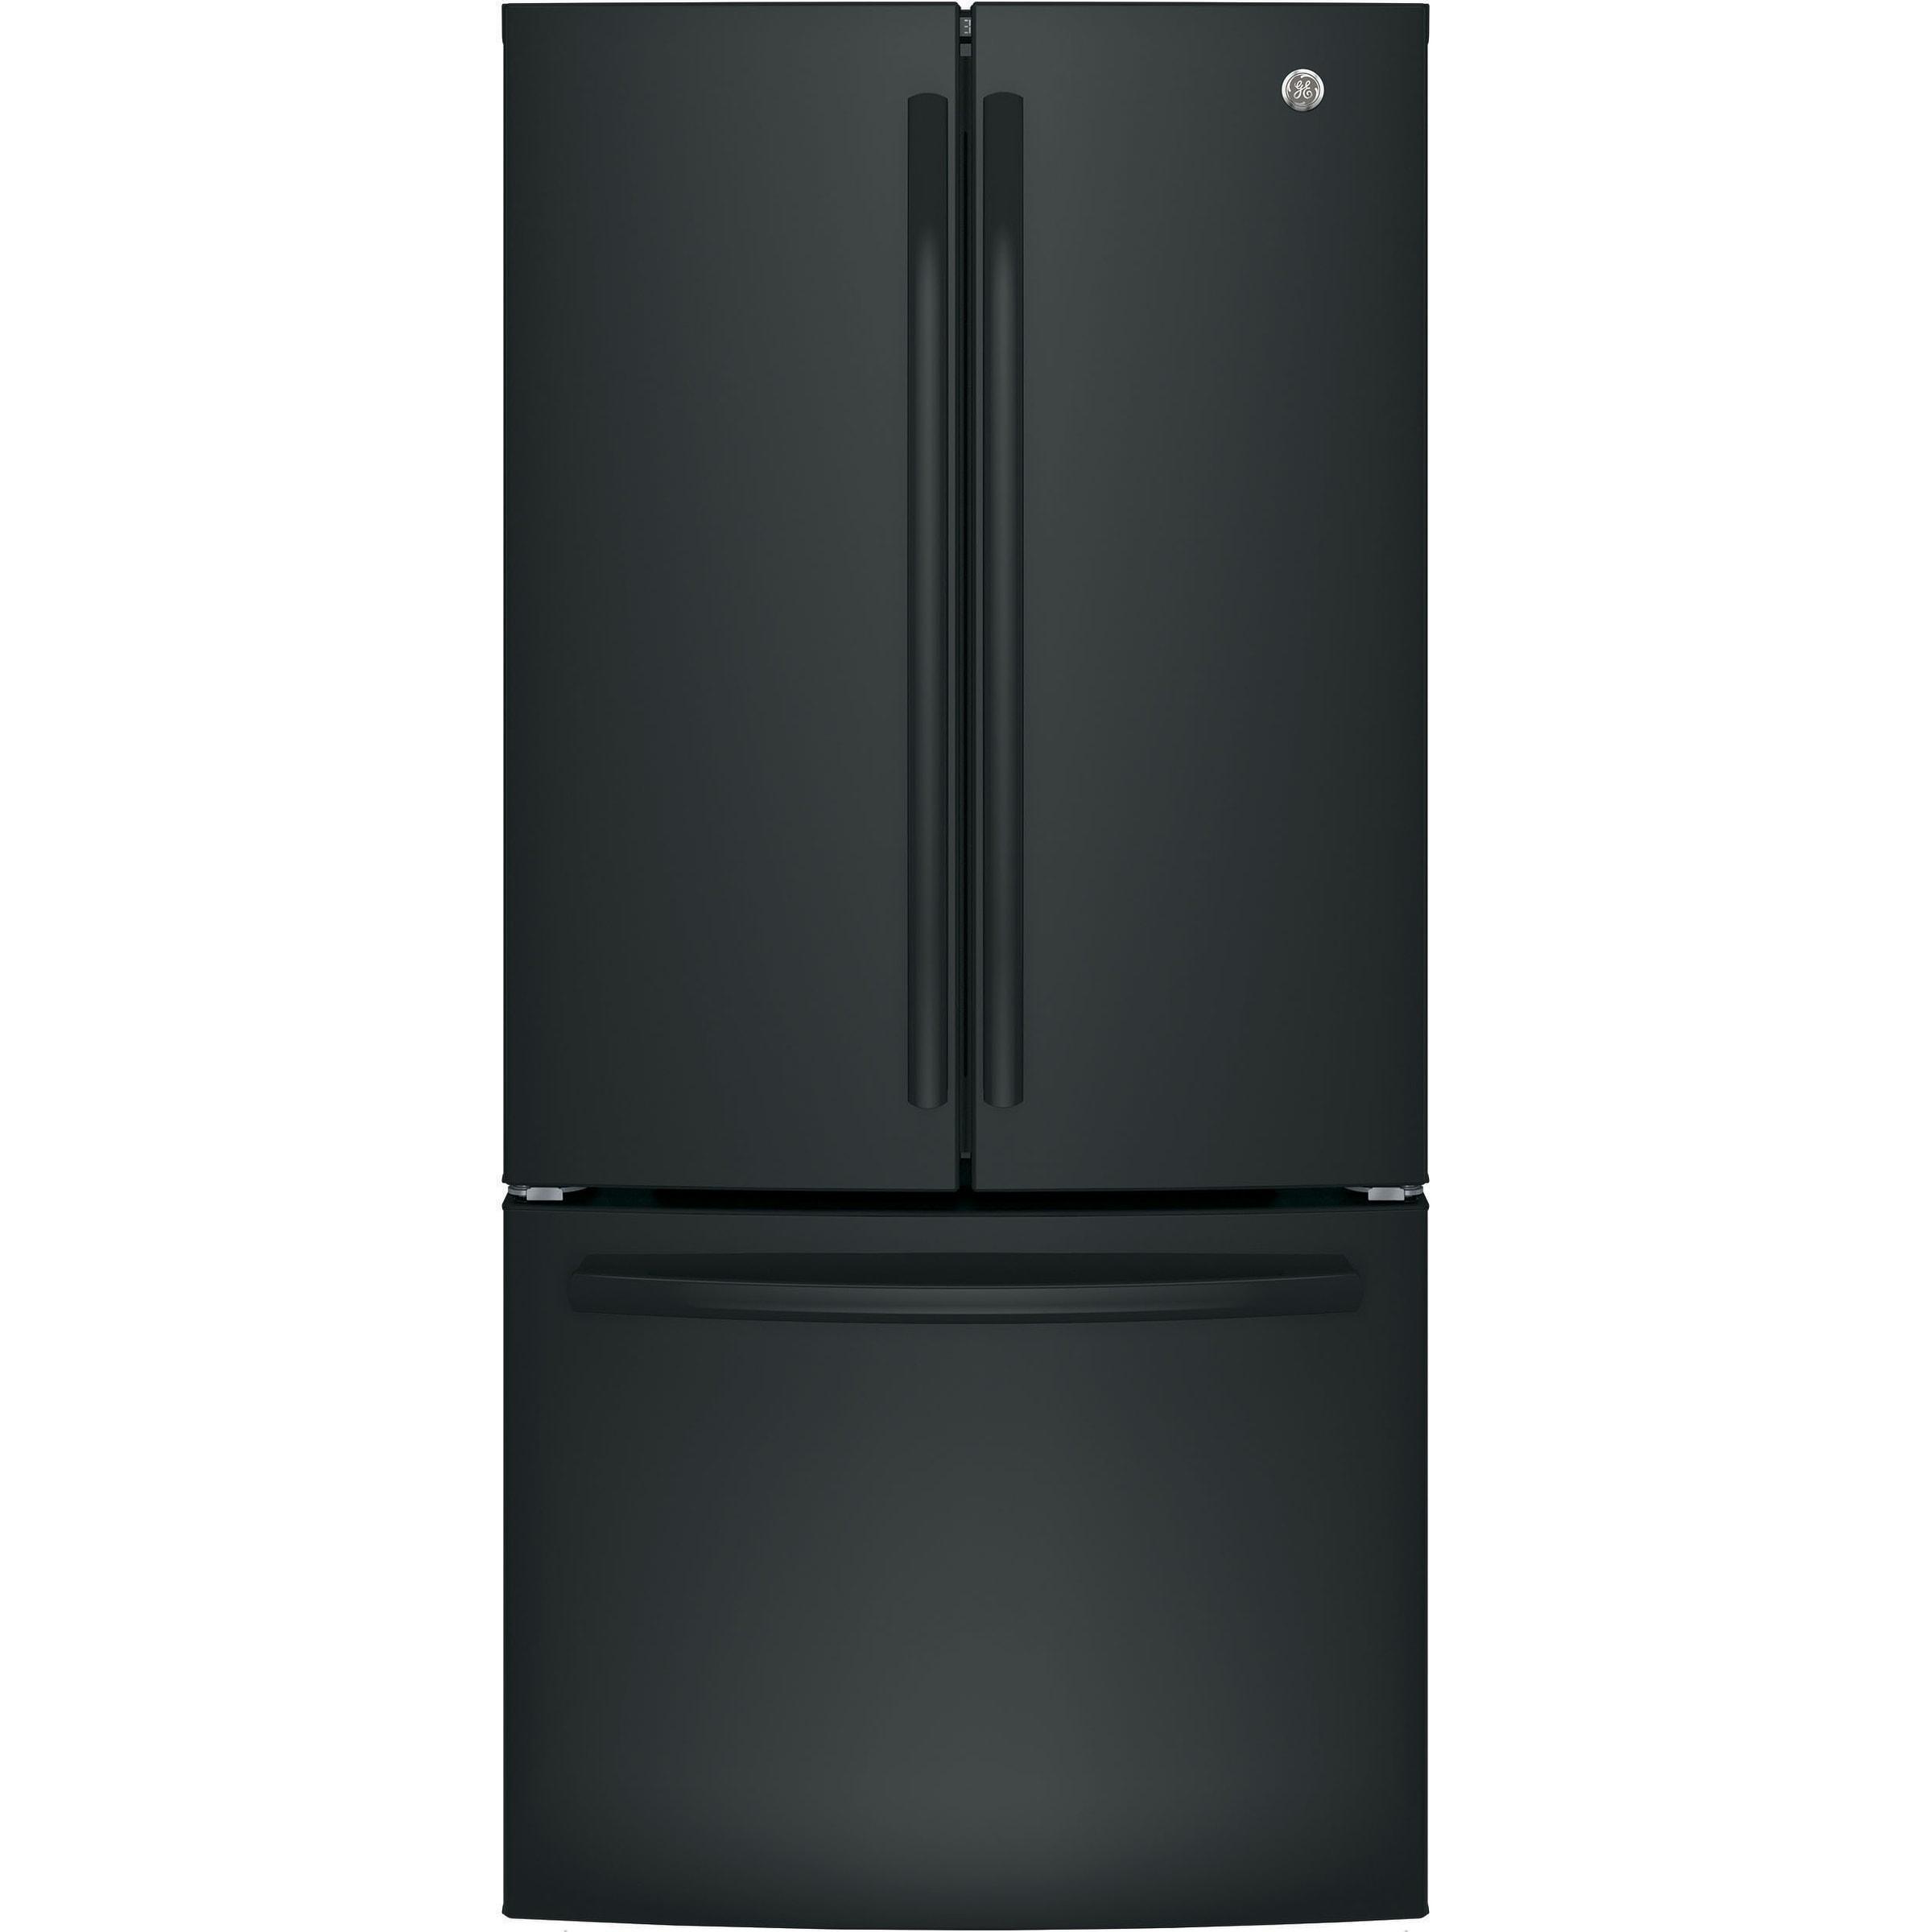 GE ENERGY STAR 18.6 Cu. Ft. Counter-Depth French-Door Refrigerator in Black Black - 4.1 - 5 cu. ft. - 3